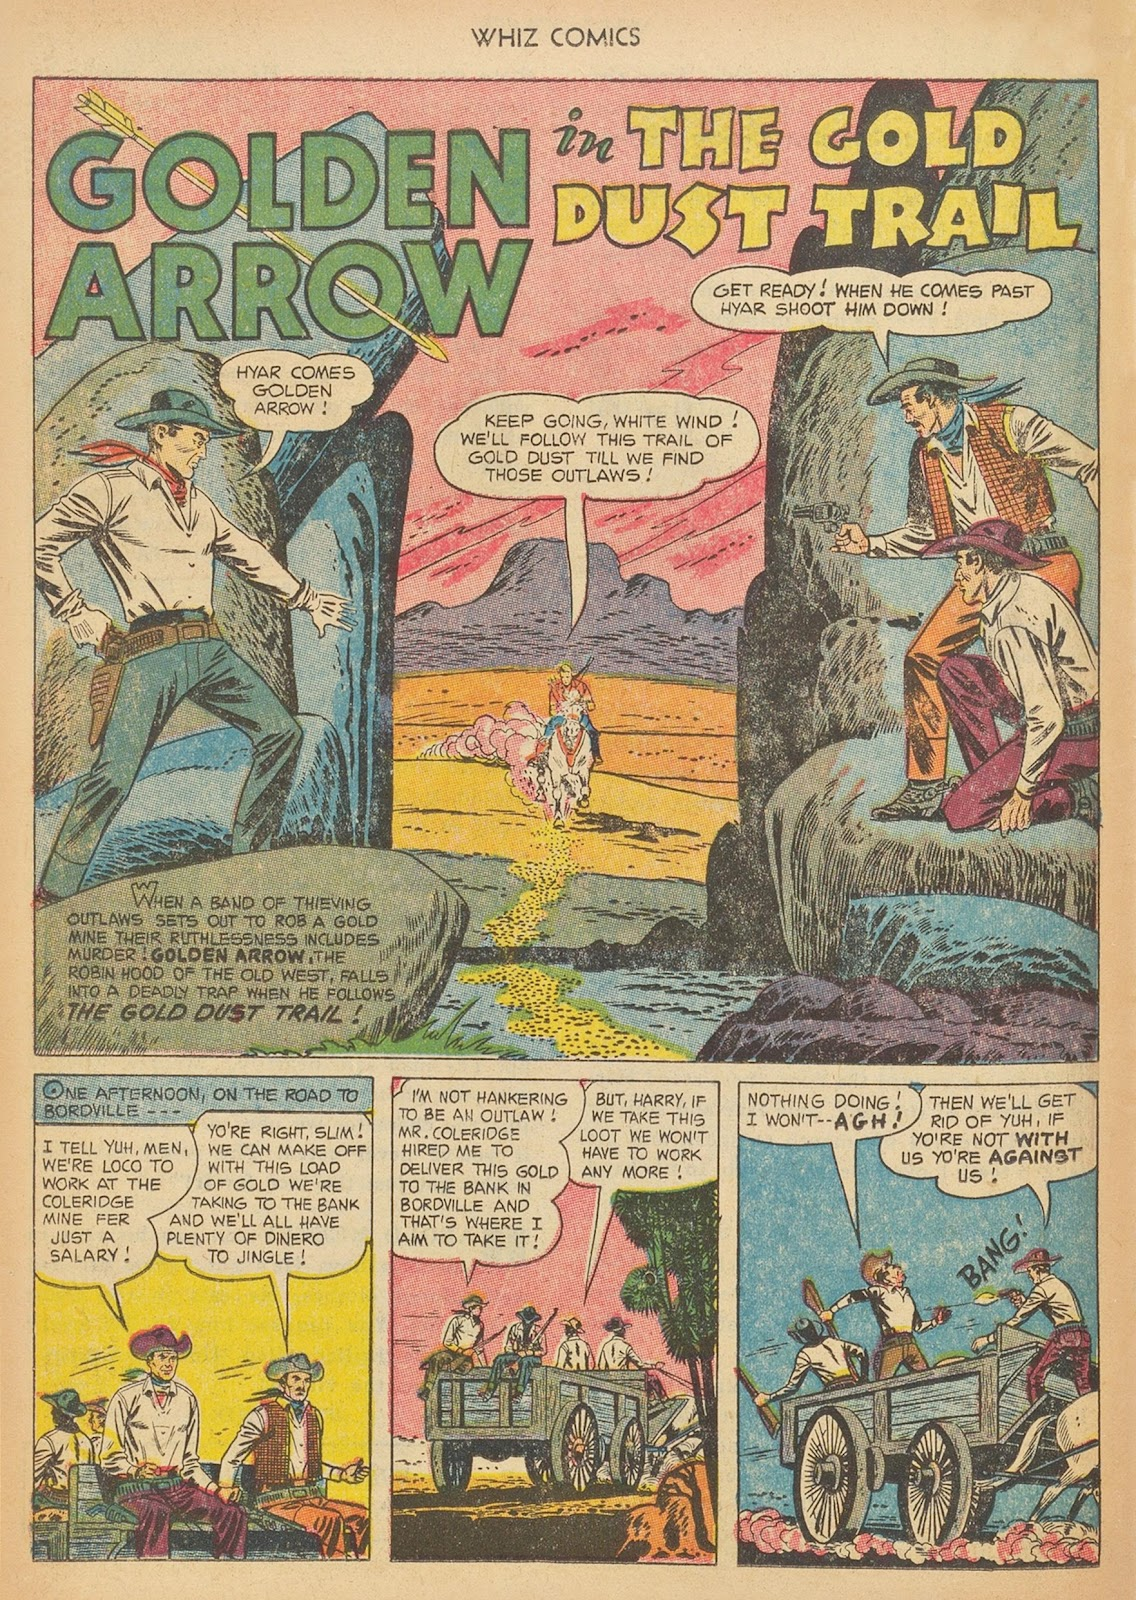 Read online WHIZ Comics comic -  Issue #153 - 18